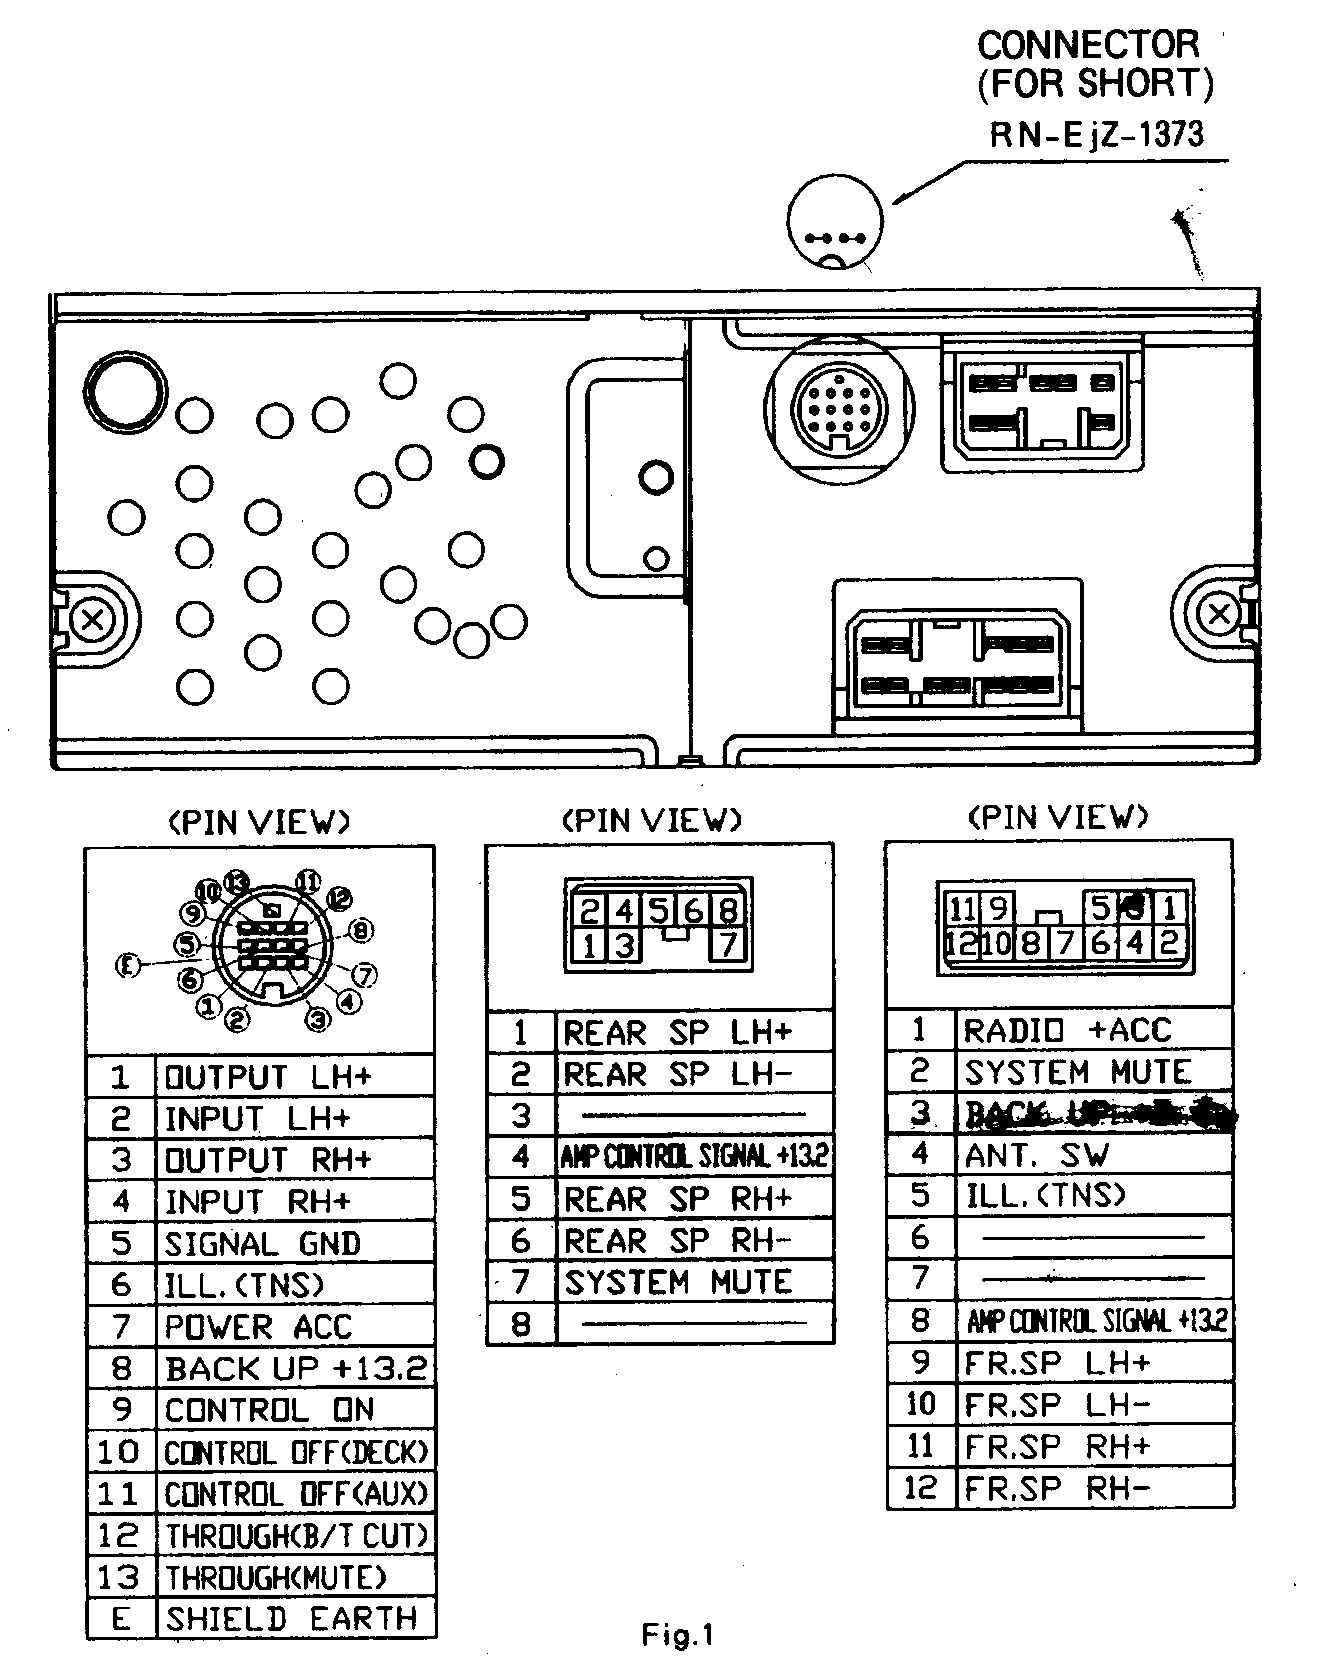 Boss Audio Wiring Diagram Radio | Wiring Diagram - Boss Audio Wiring Diagram